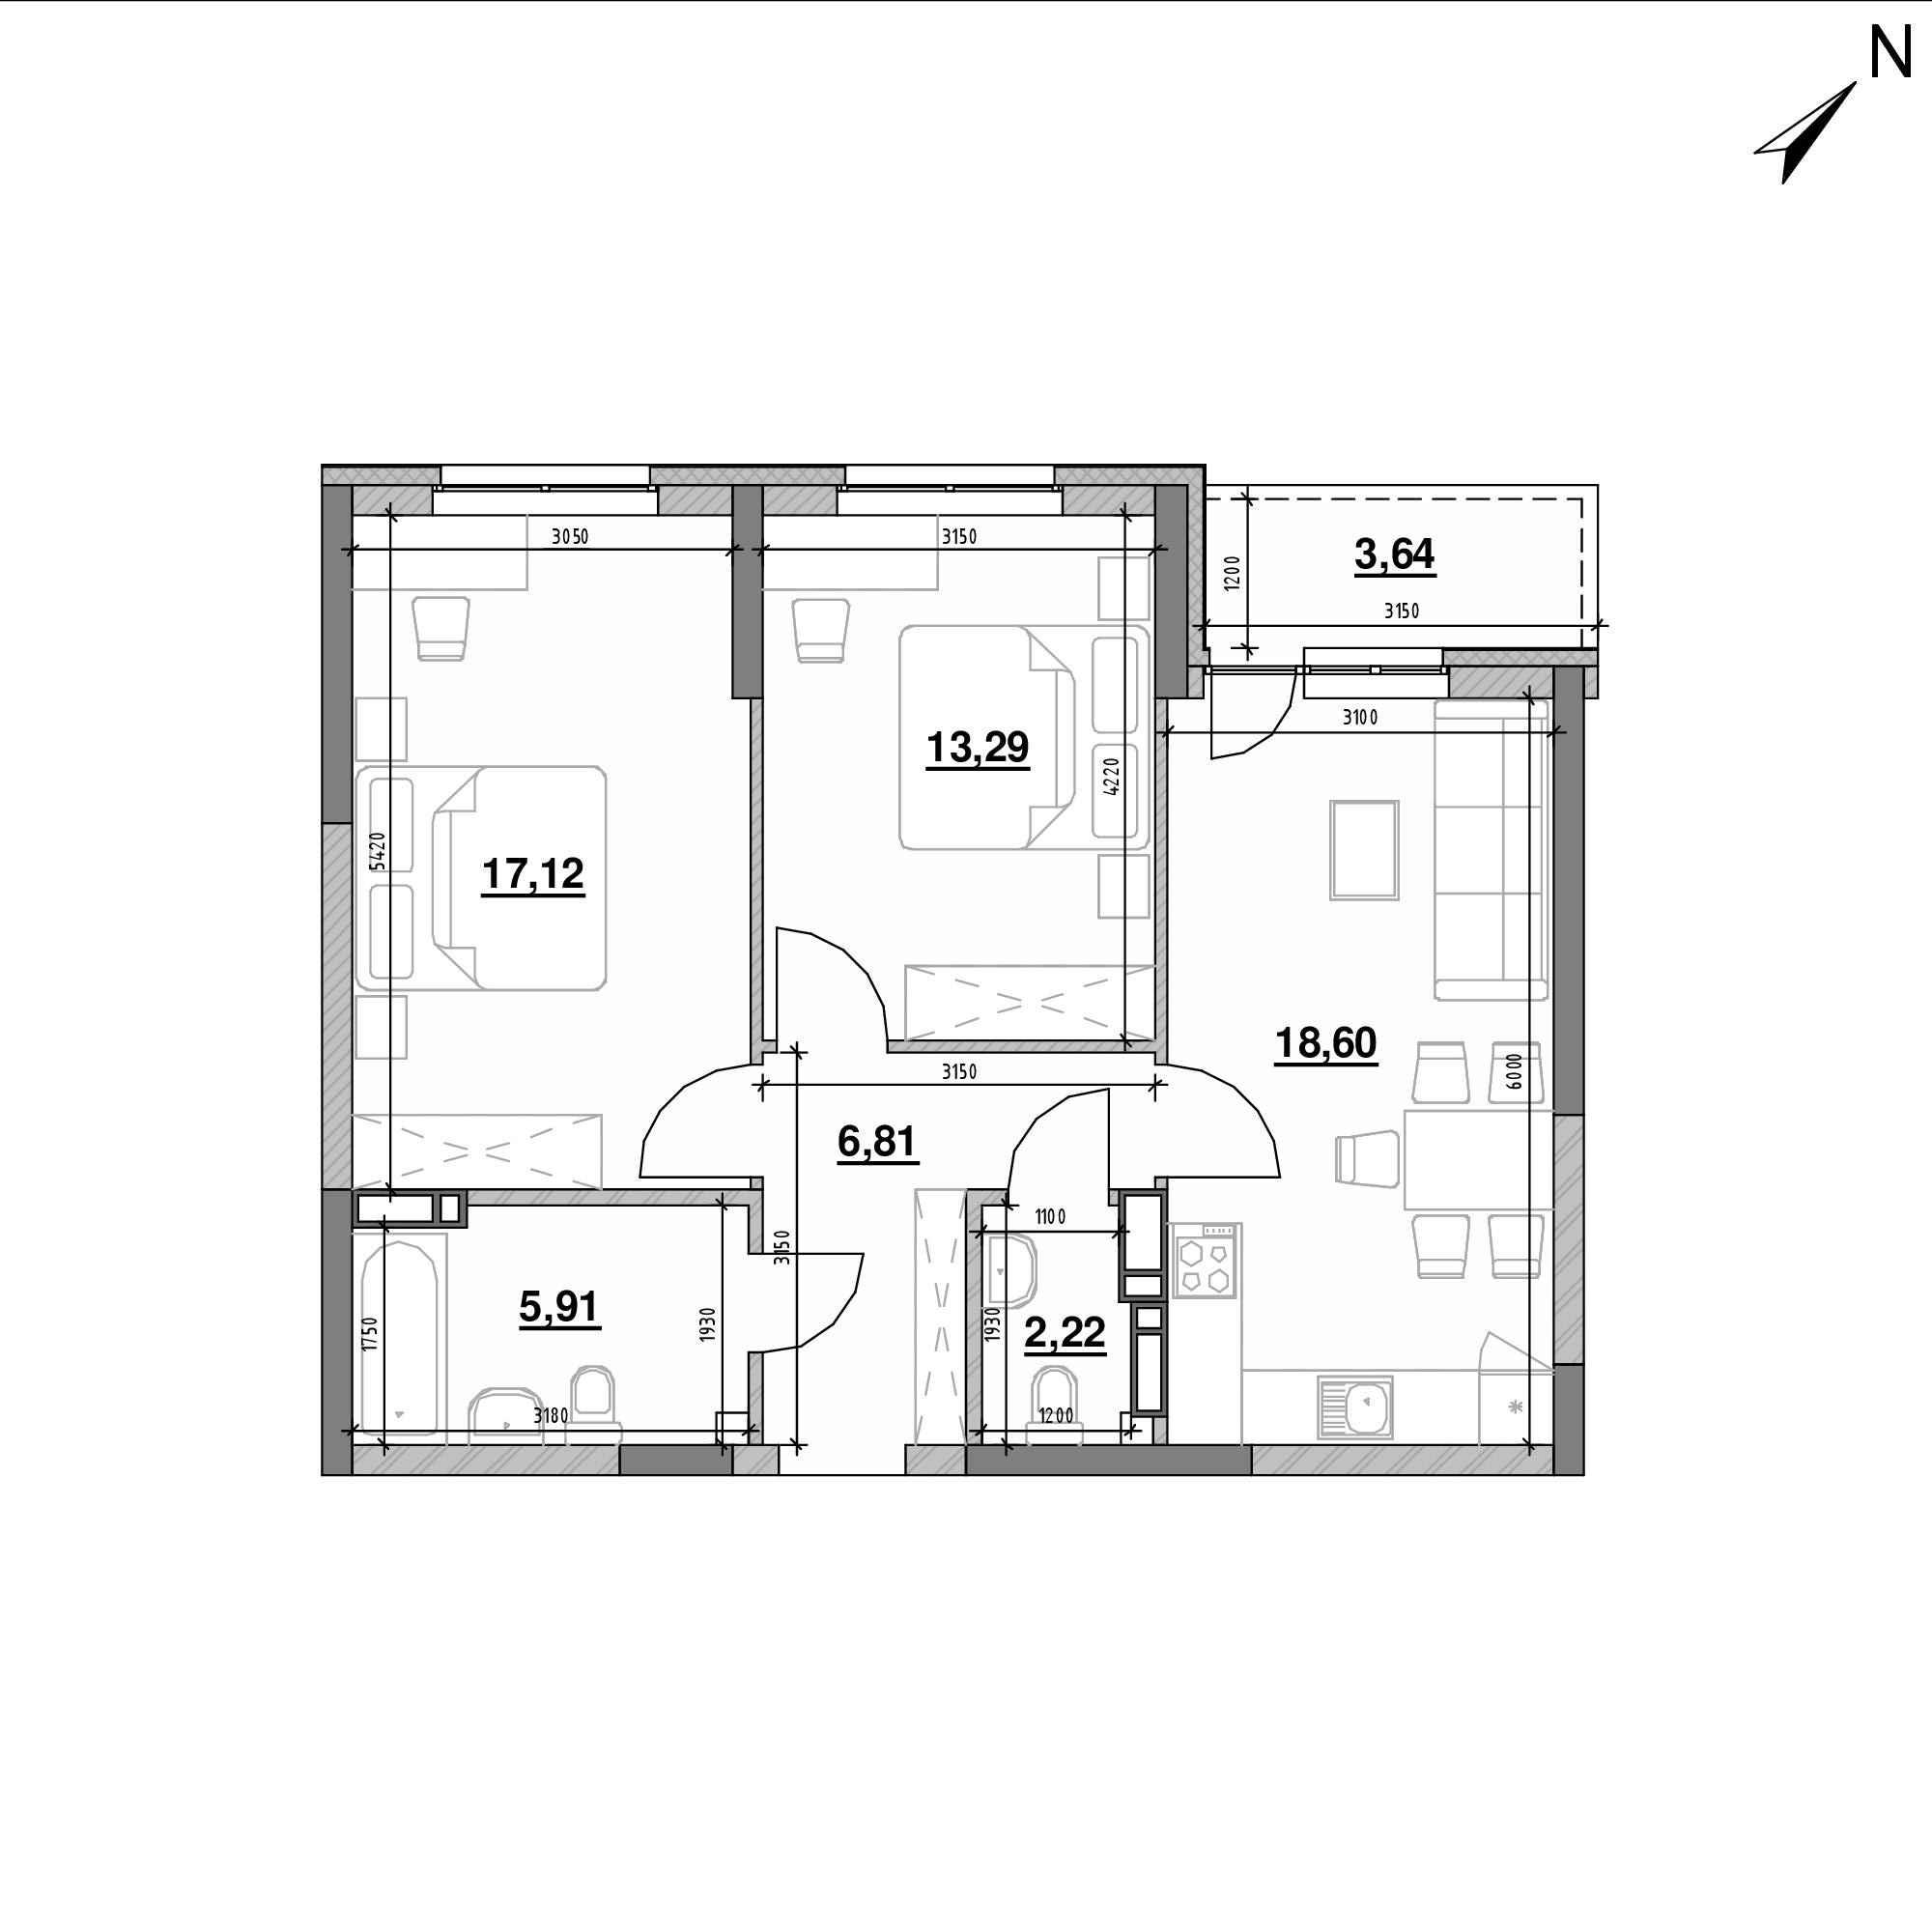 ЖК Оk'Land: планування 2-кімнатної квартири, №506, 67.59 м<sup>2</sup>